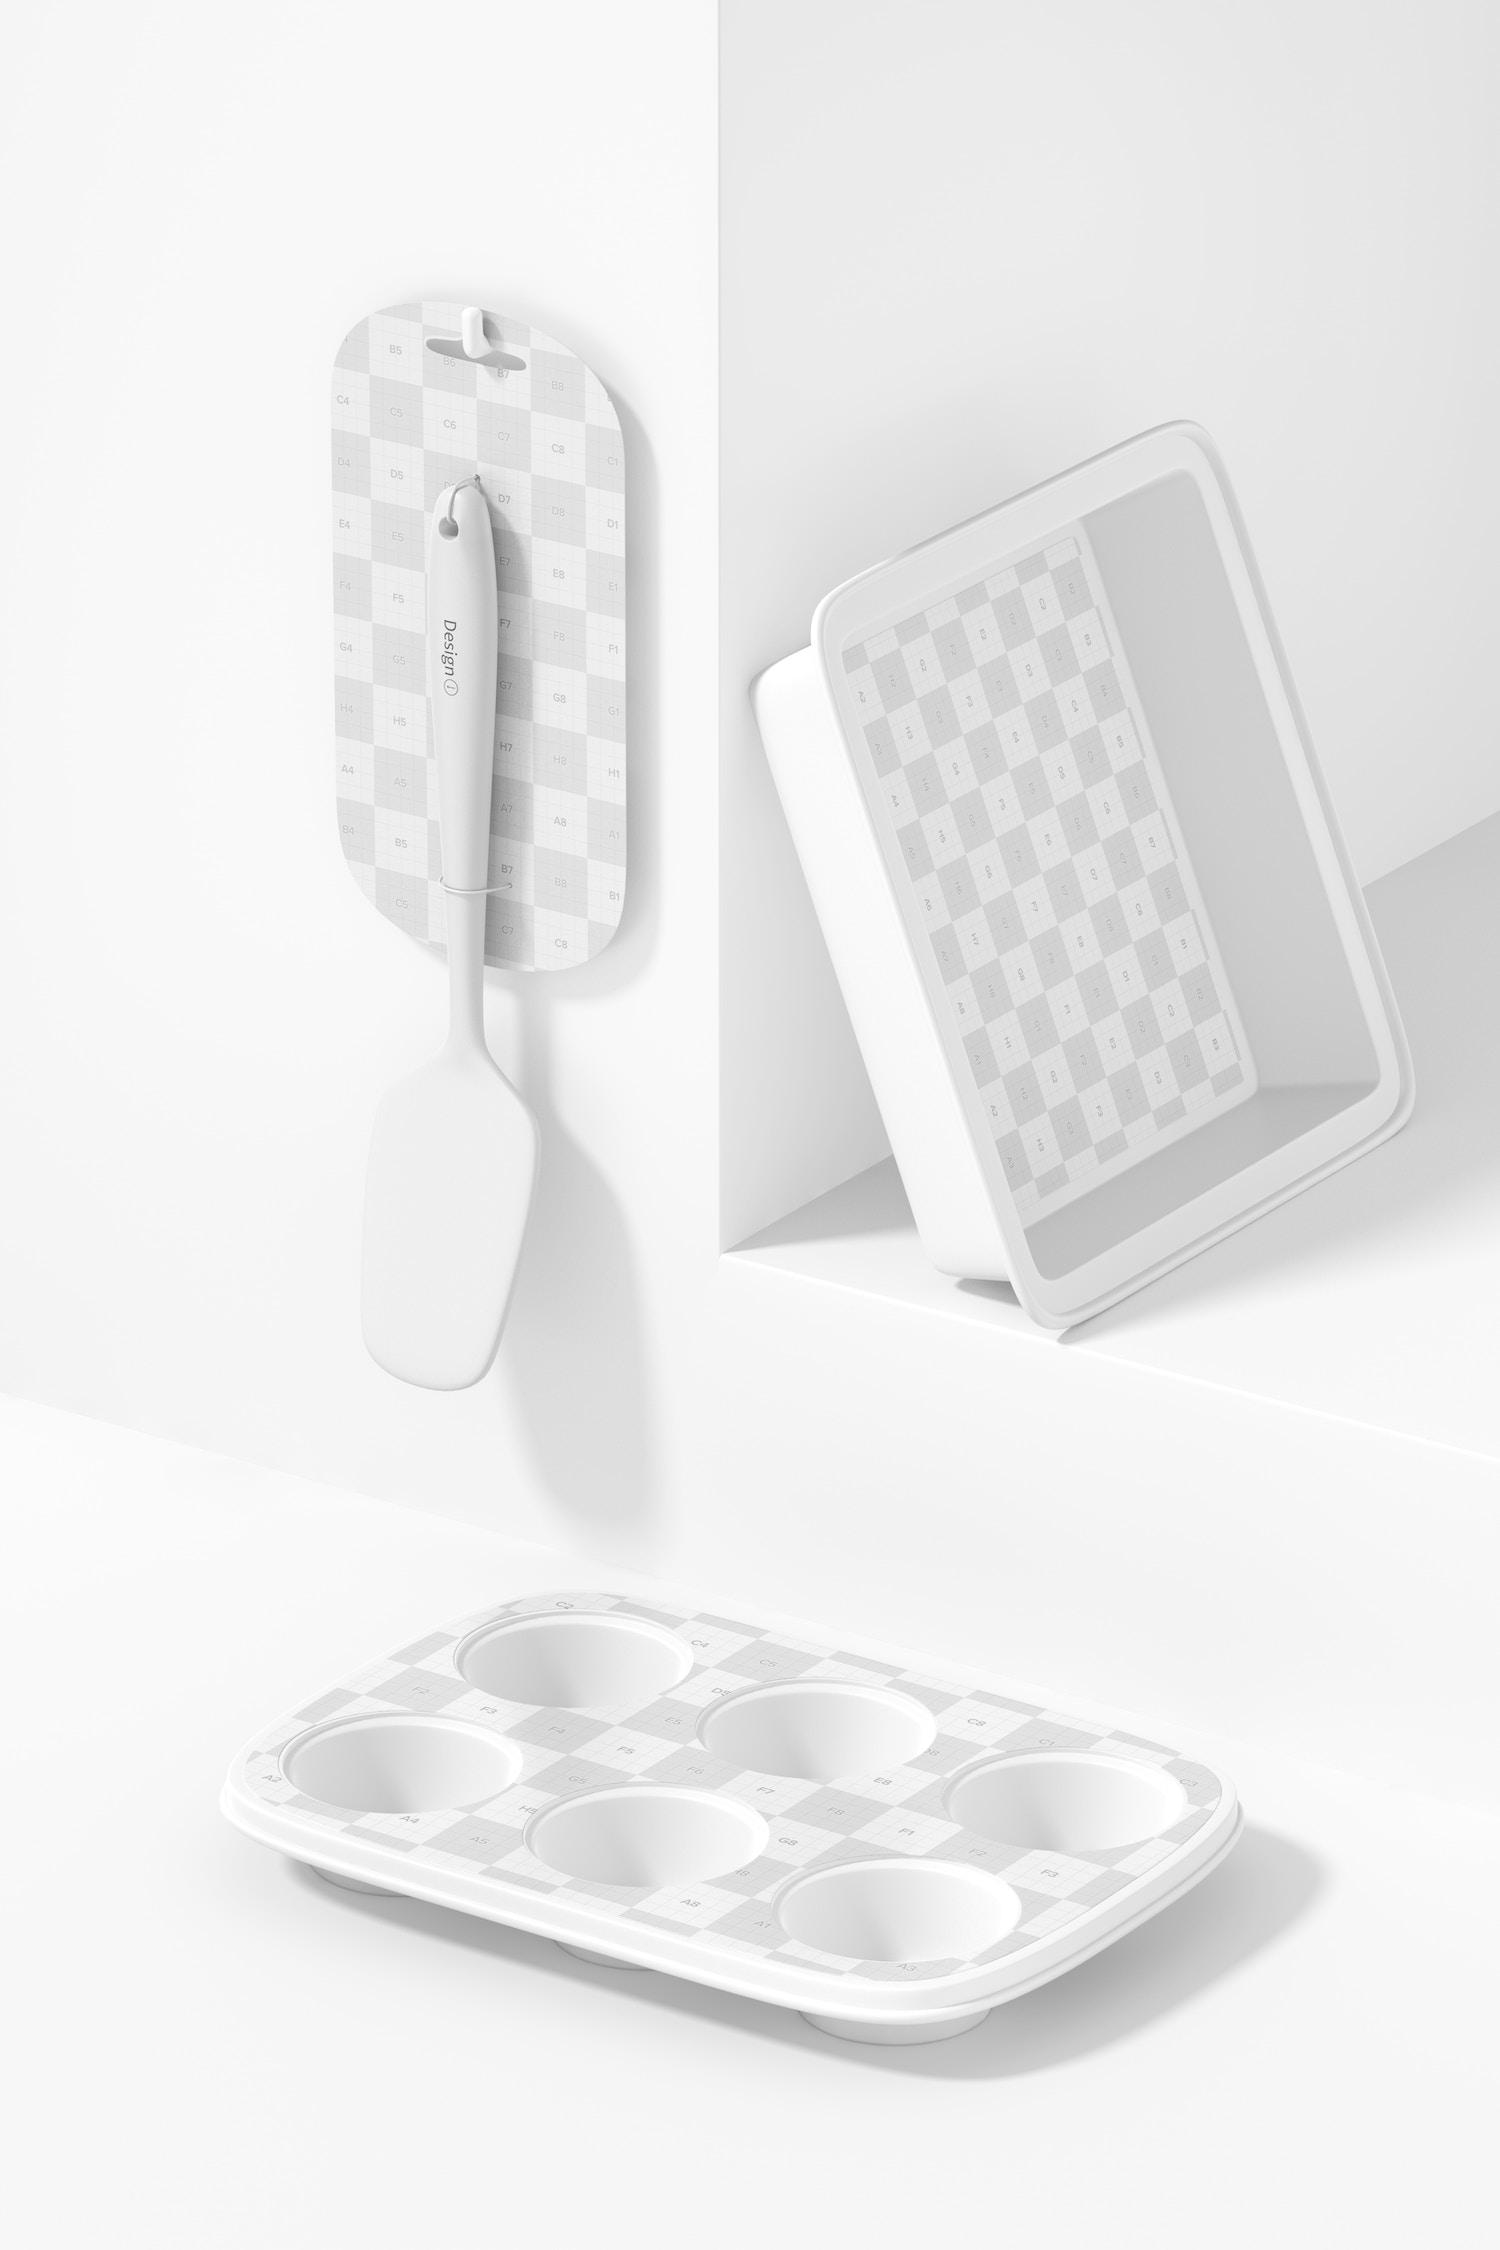 Baking Tools Scene Mockup, Perspective View